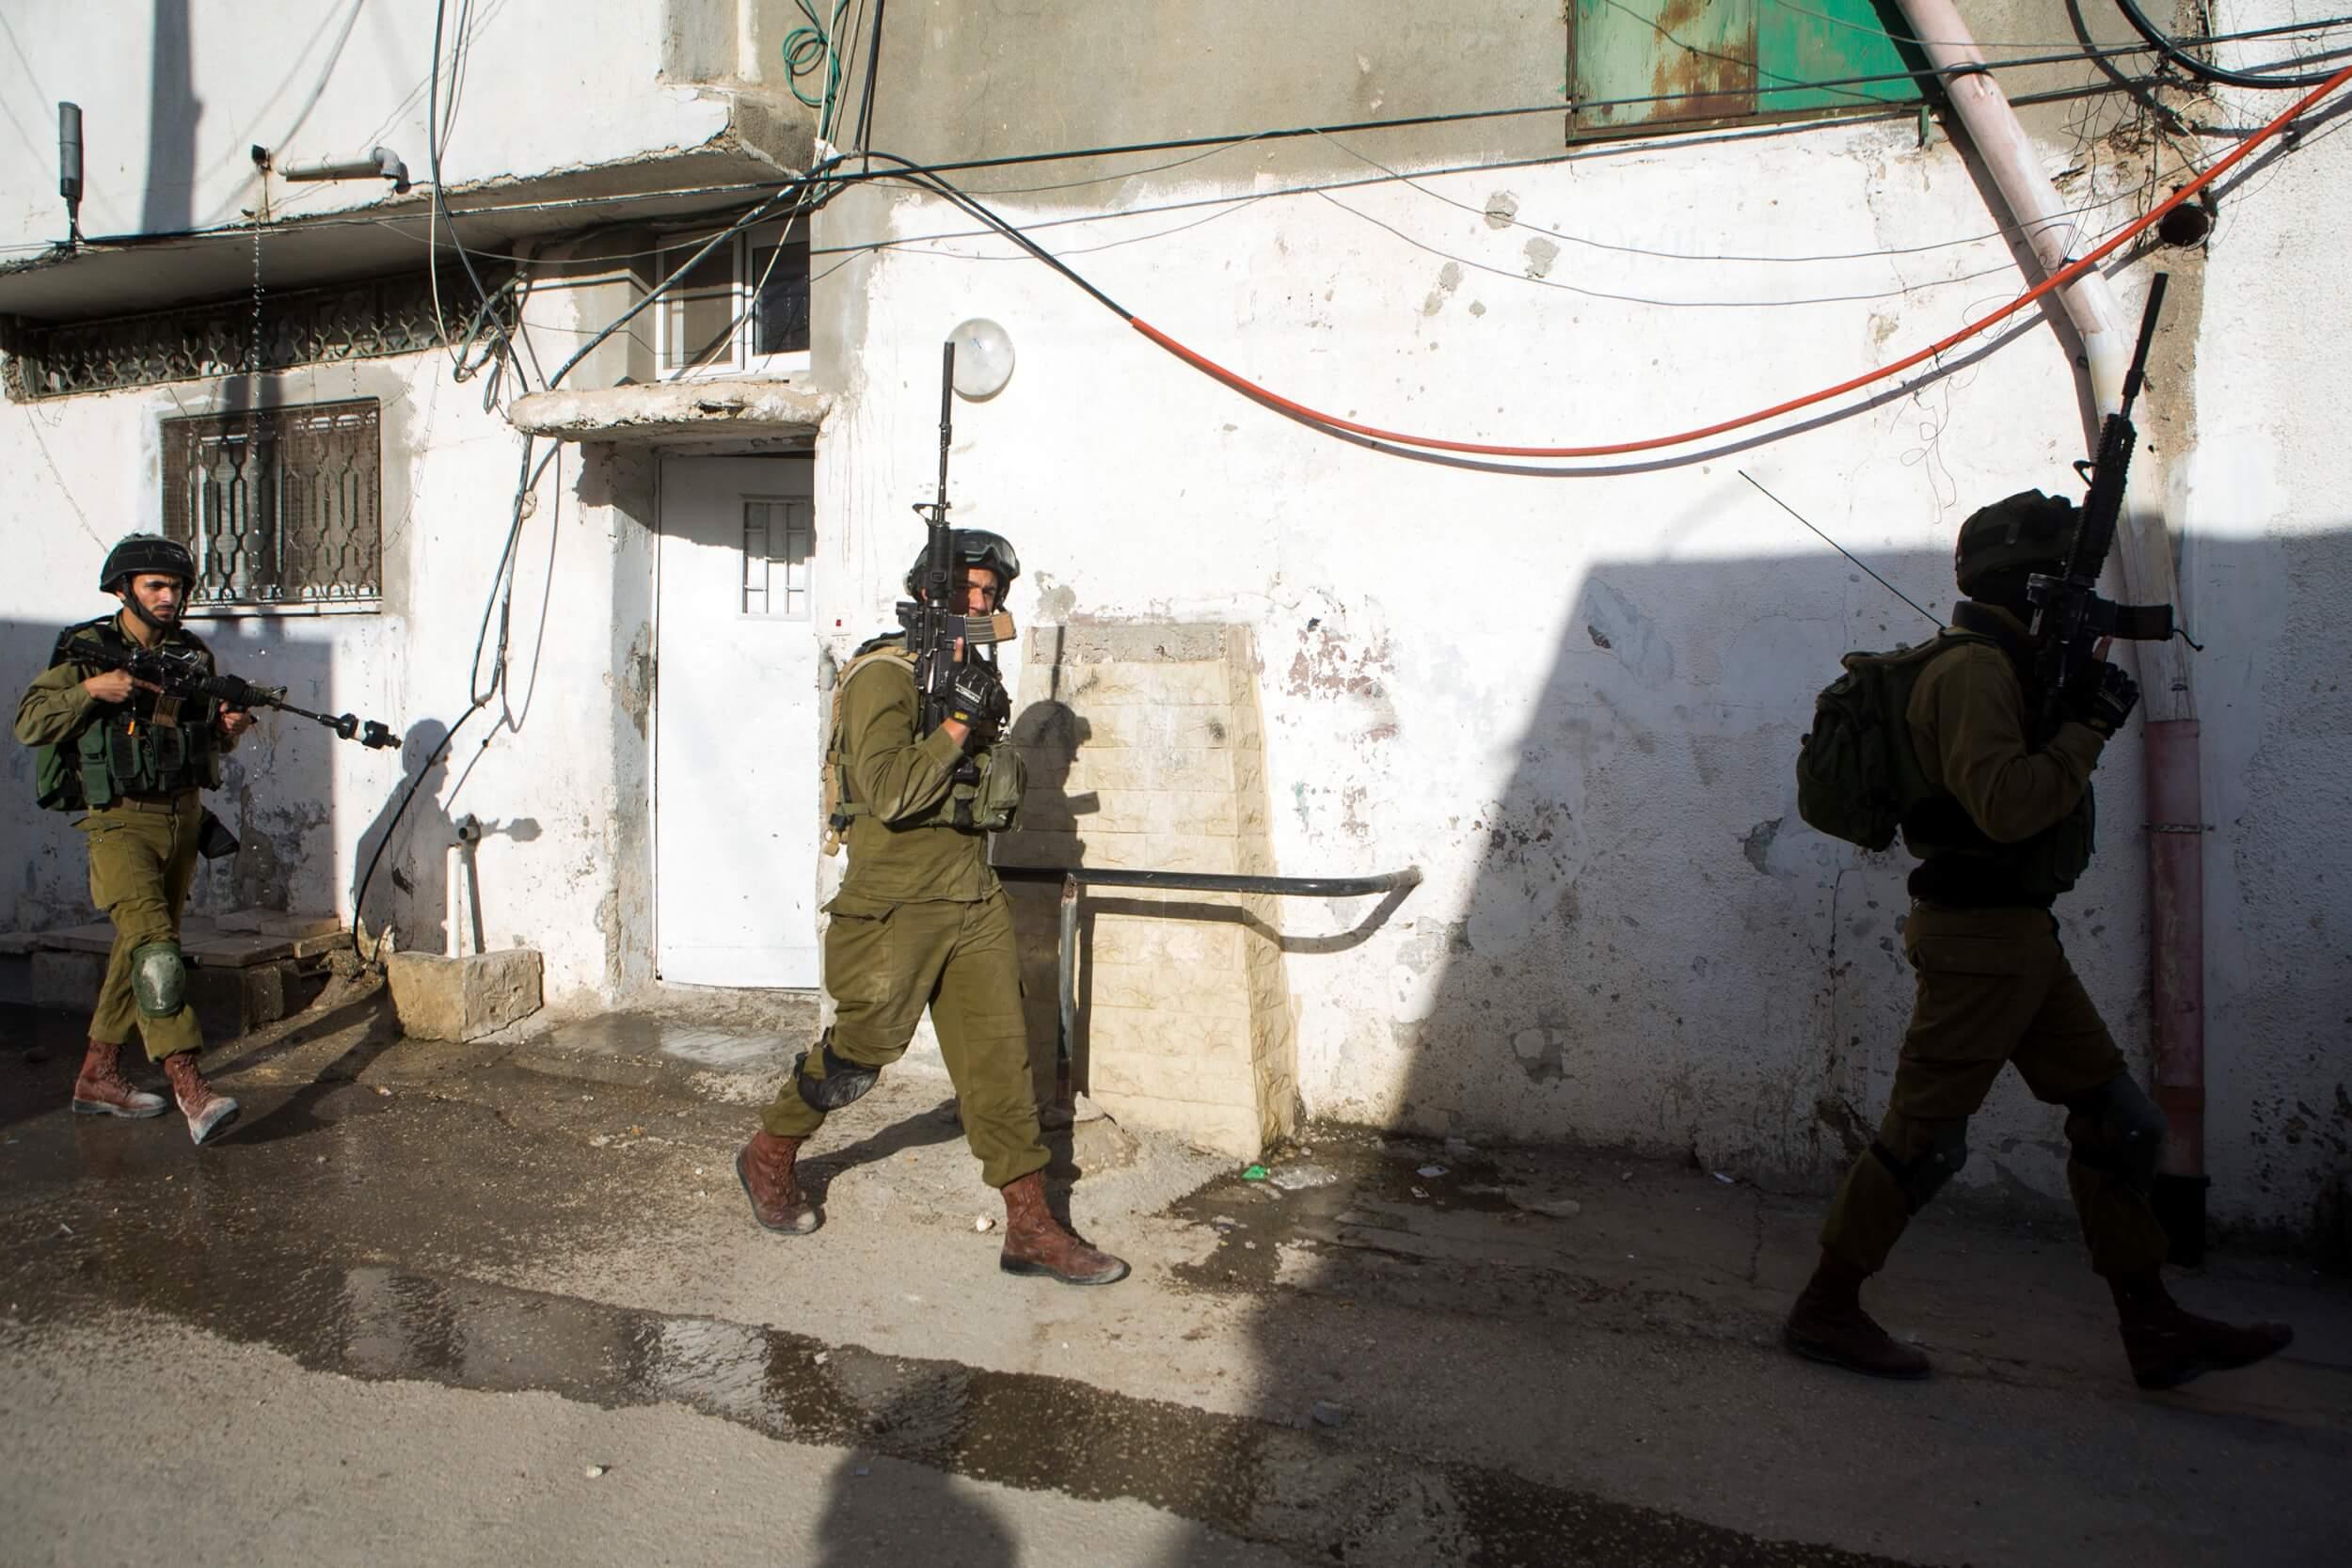 Israeli soldiers, entering al Arroub camp, photo by Anne Paq